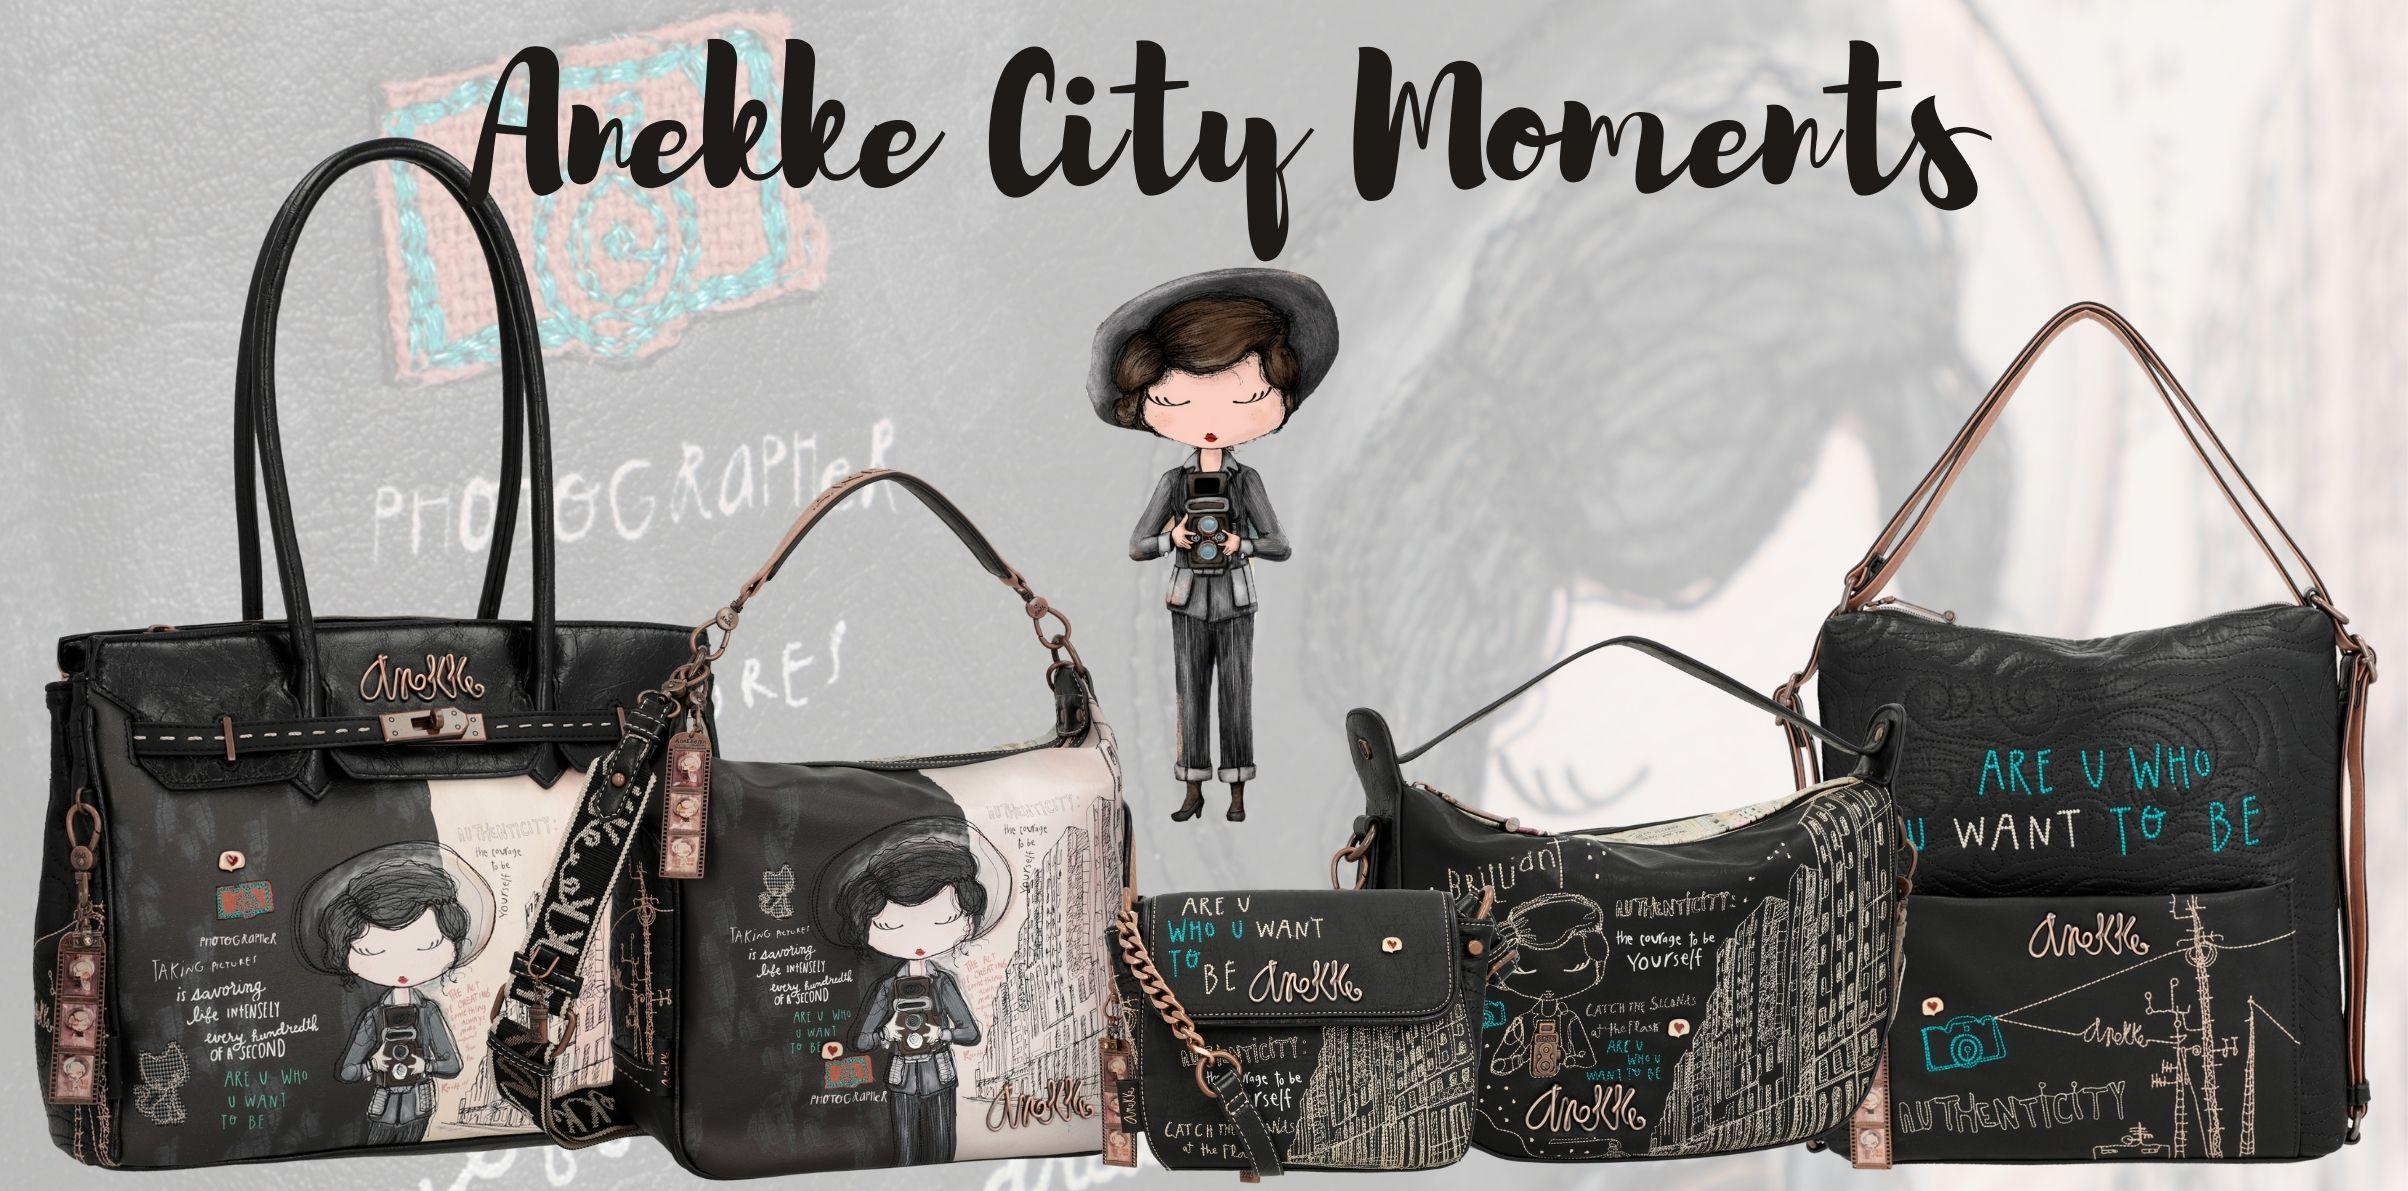 Anekke City Moments